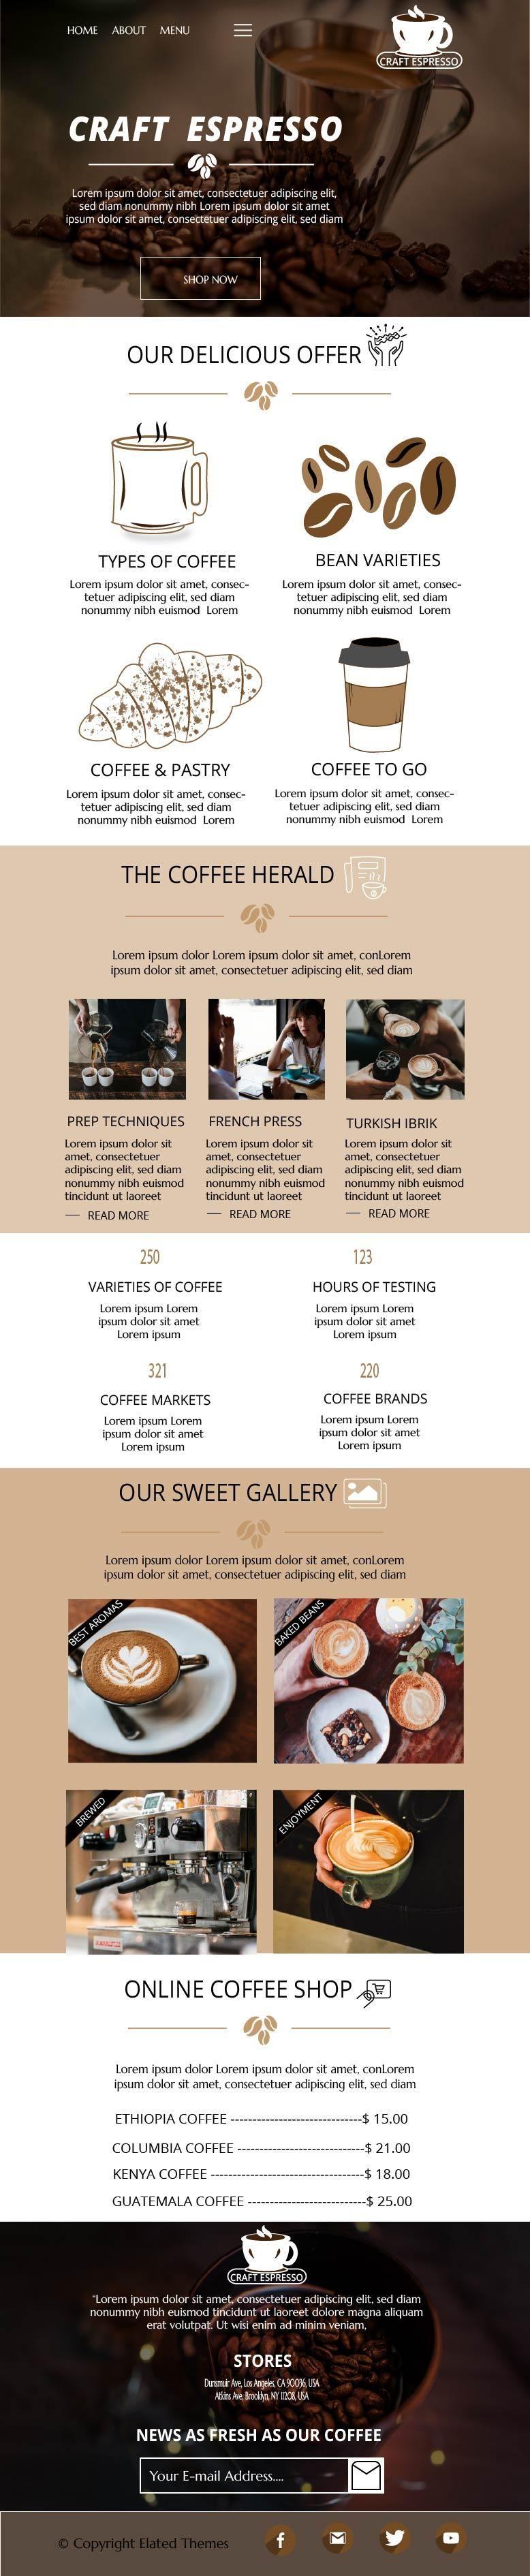 Craft Espresso Web design - image 2 - student project